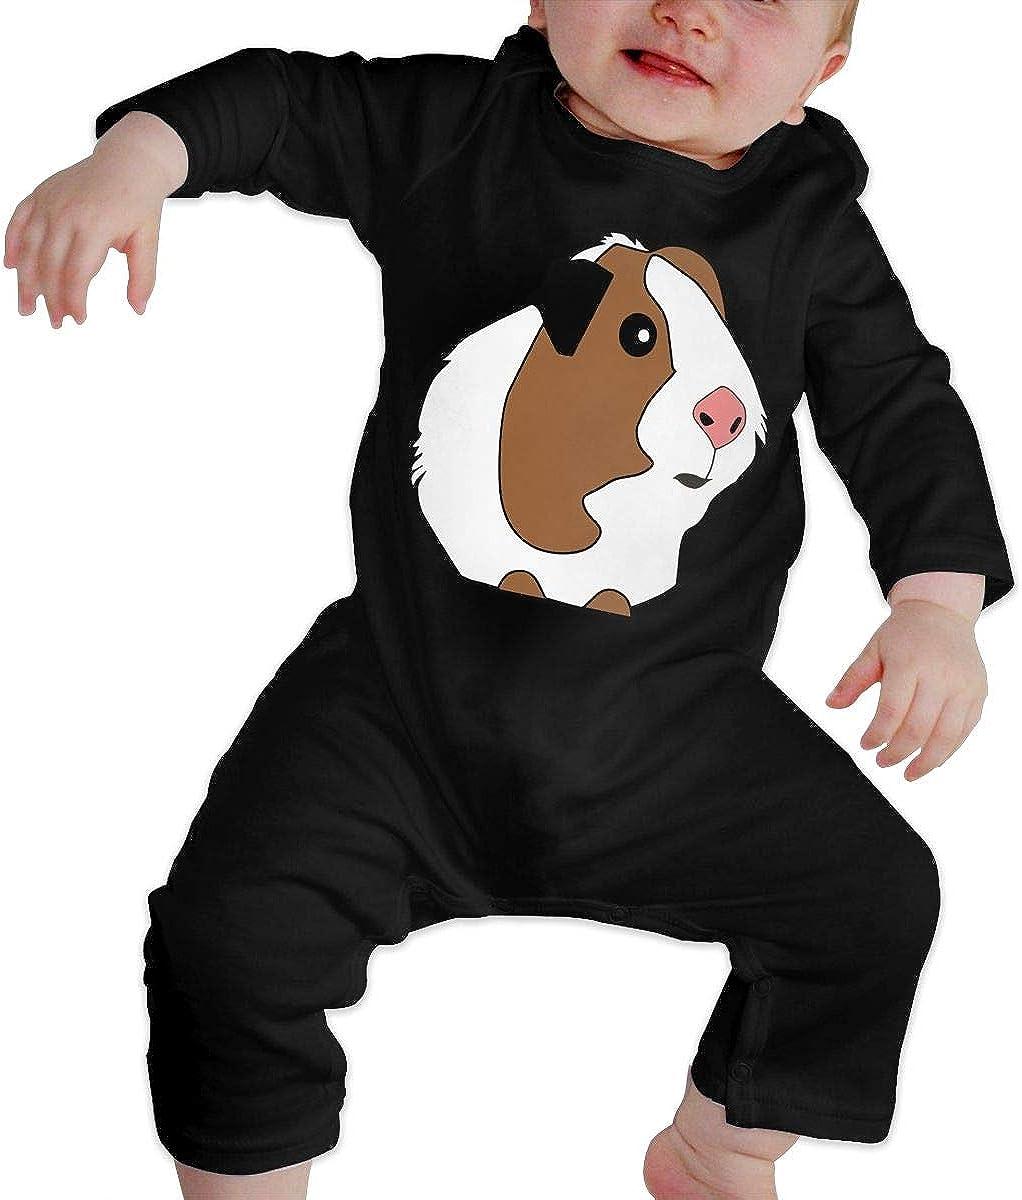 Guinea Pig Printed Boys Girls Bodysuit Long Sleeve Romper Black